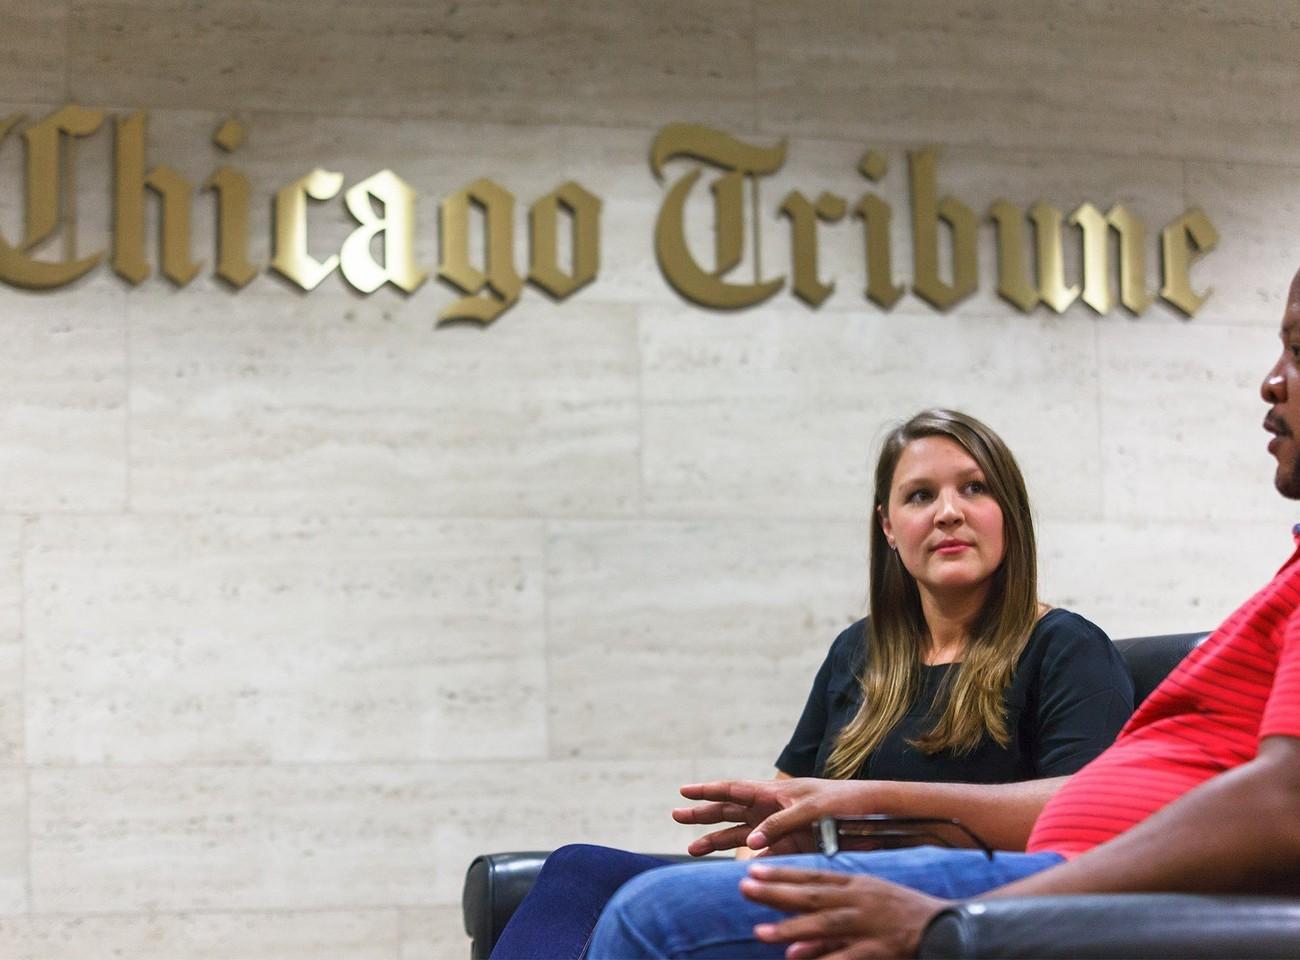 Tribune Publishing Careers